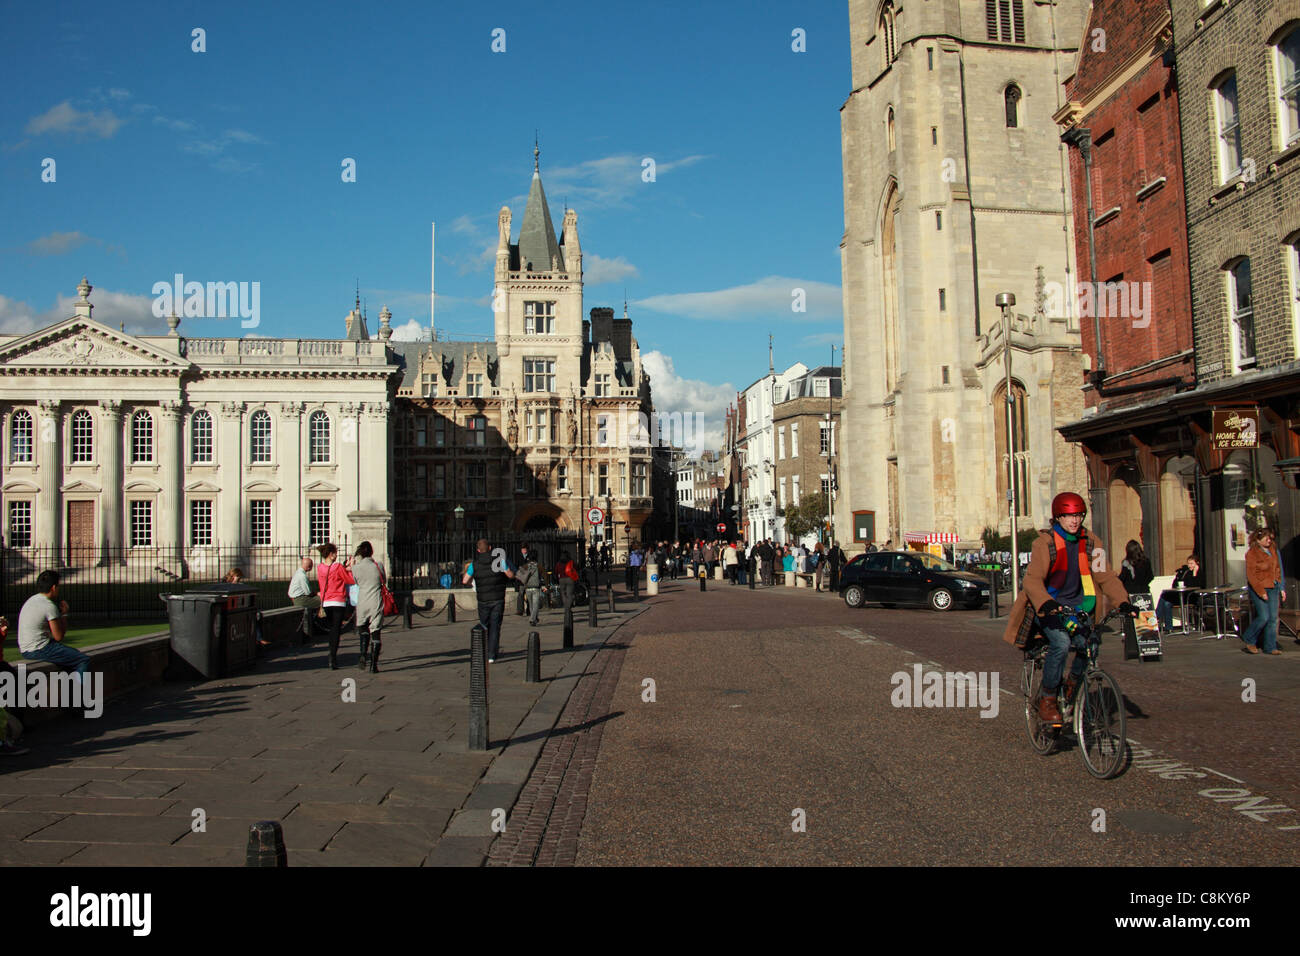 King's Parade, Cambridge, UK - Stock Image